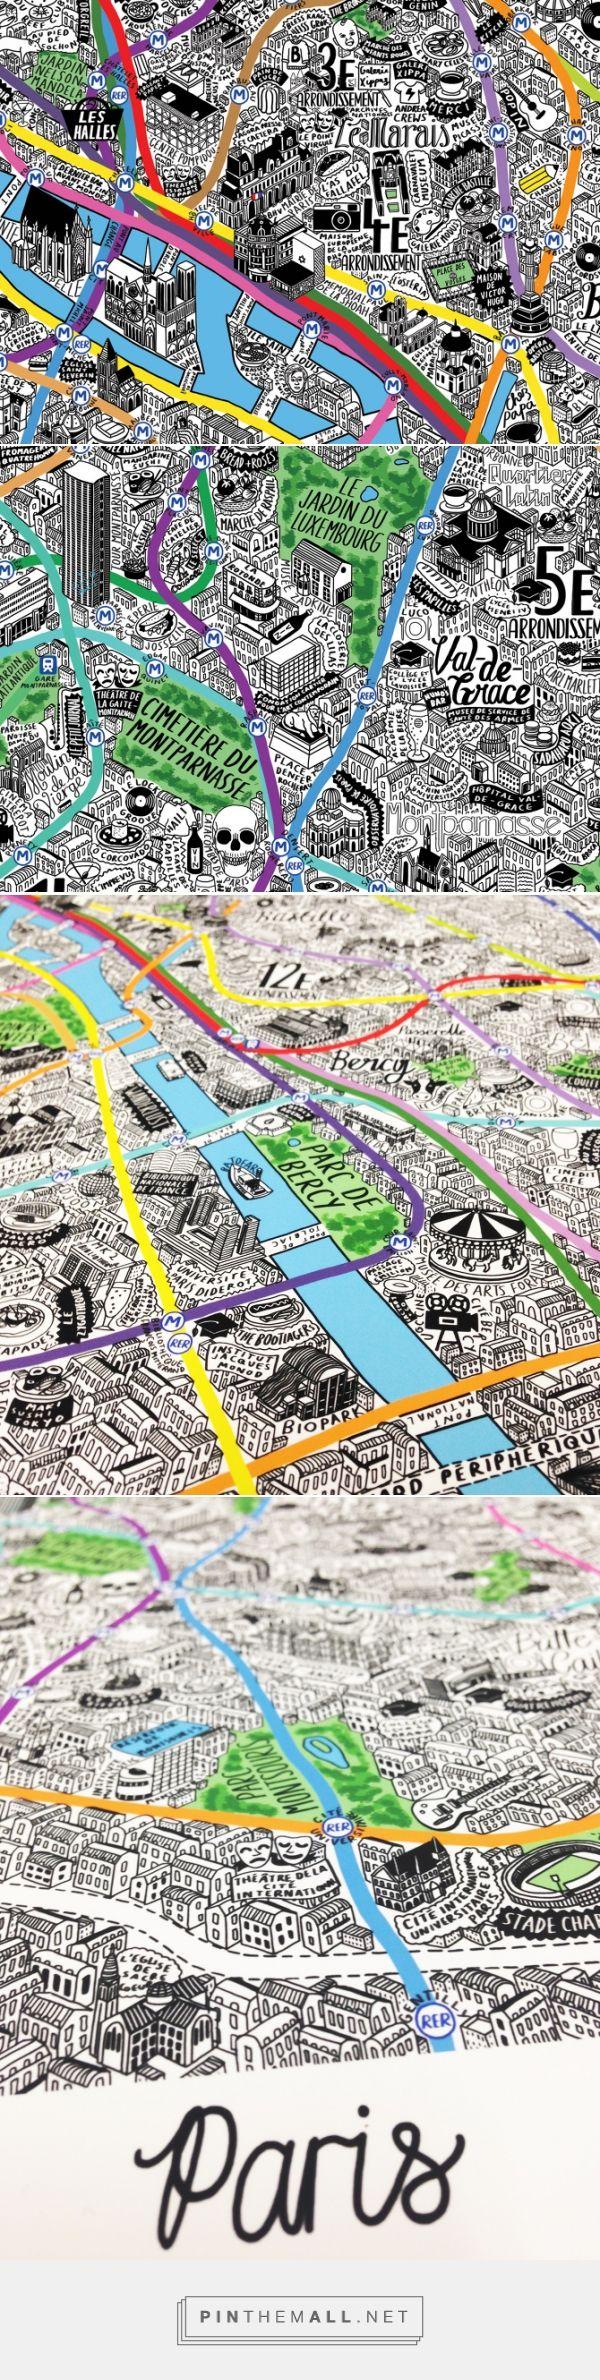 Hand Drawn Map of Paris - Jenni Sparks - created via http://pinthemall.net